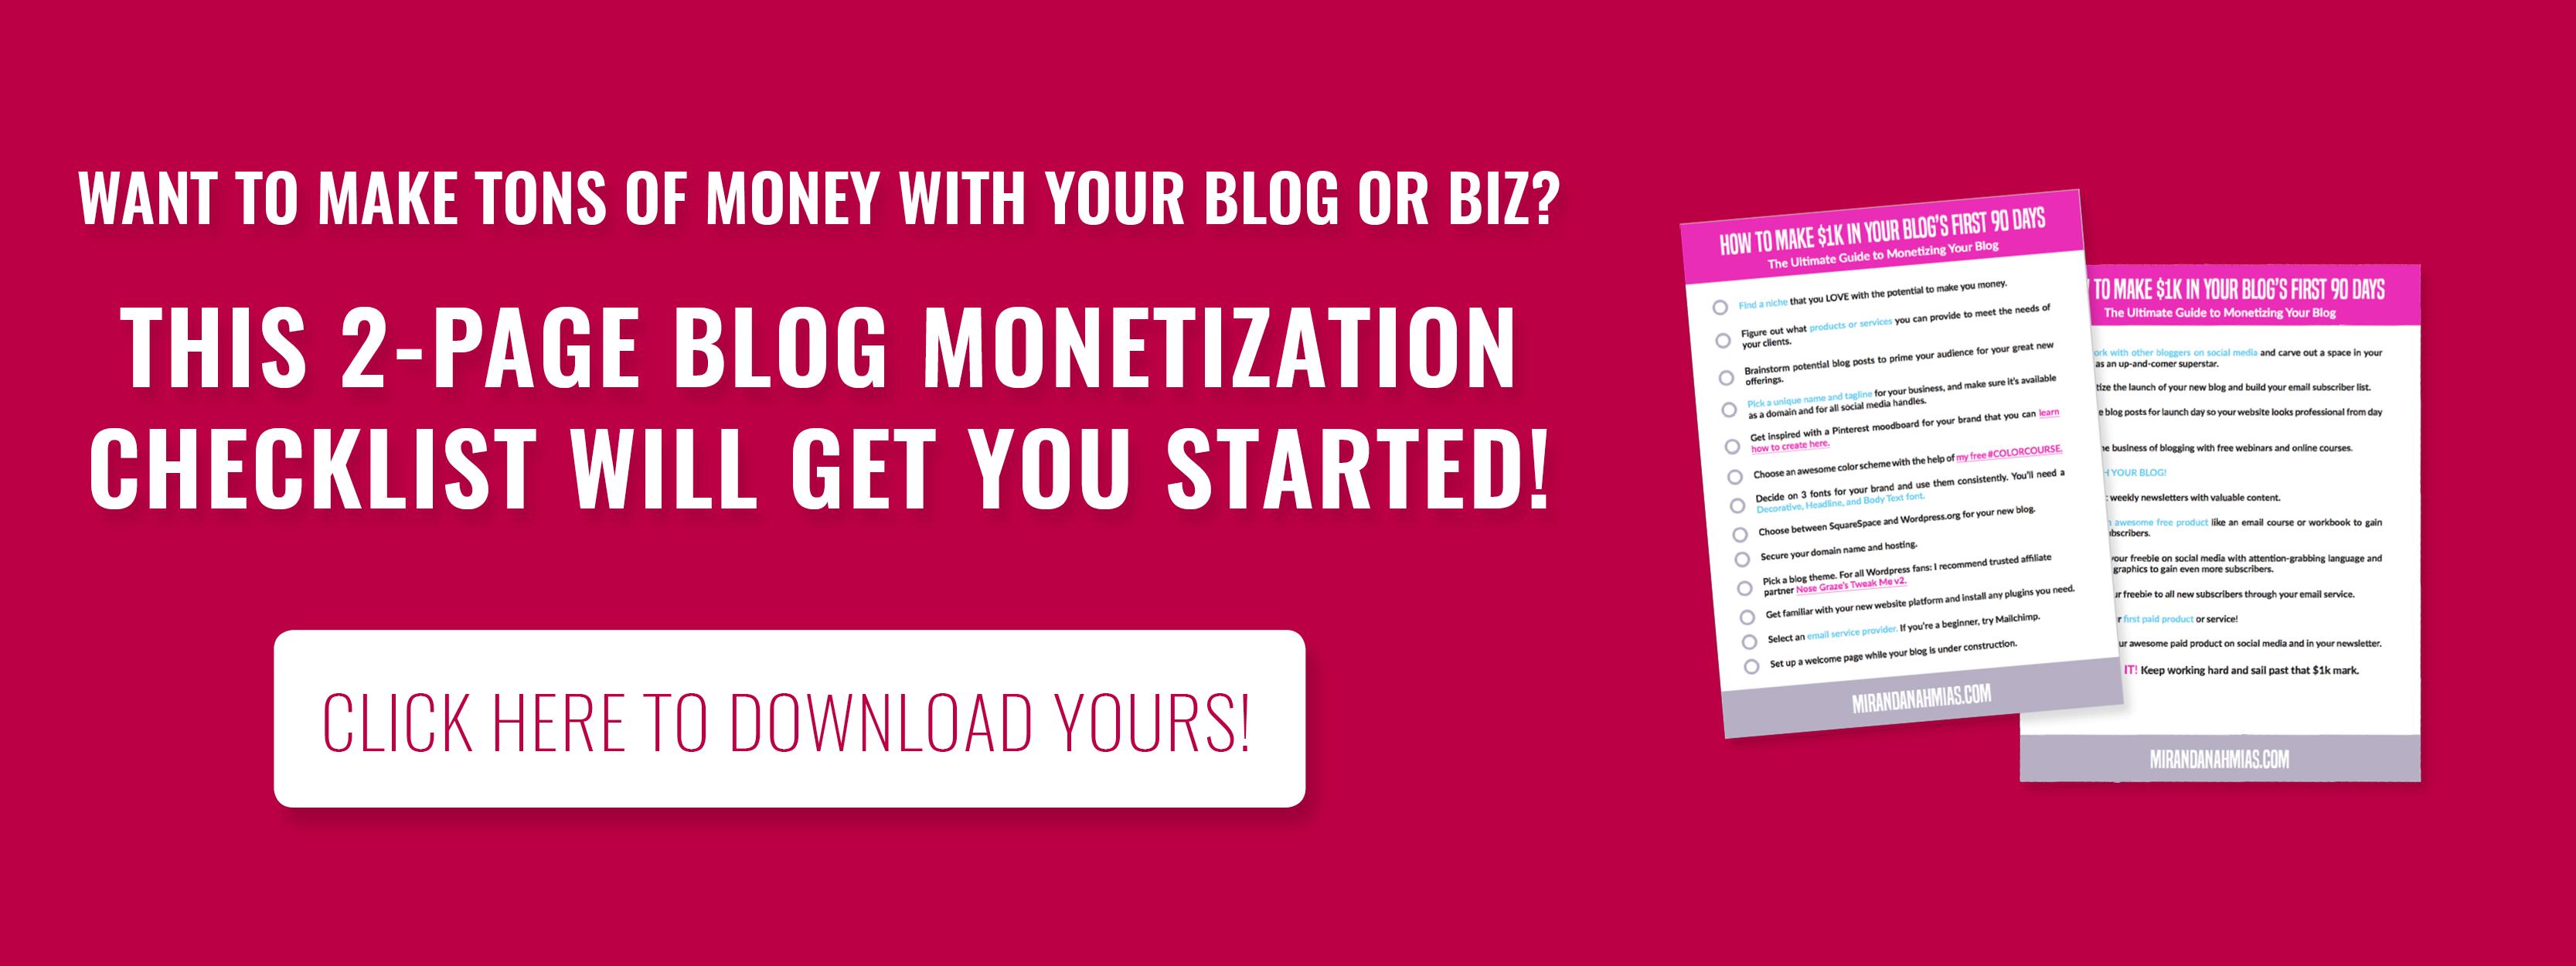 Blog Monetization Checklist Miranda Nahmias